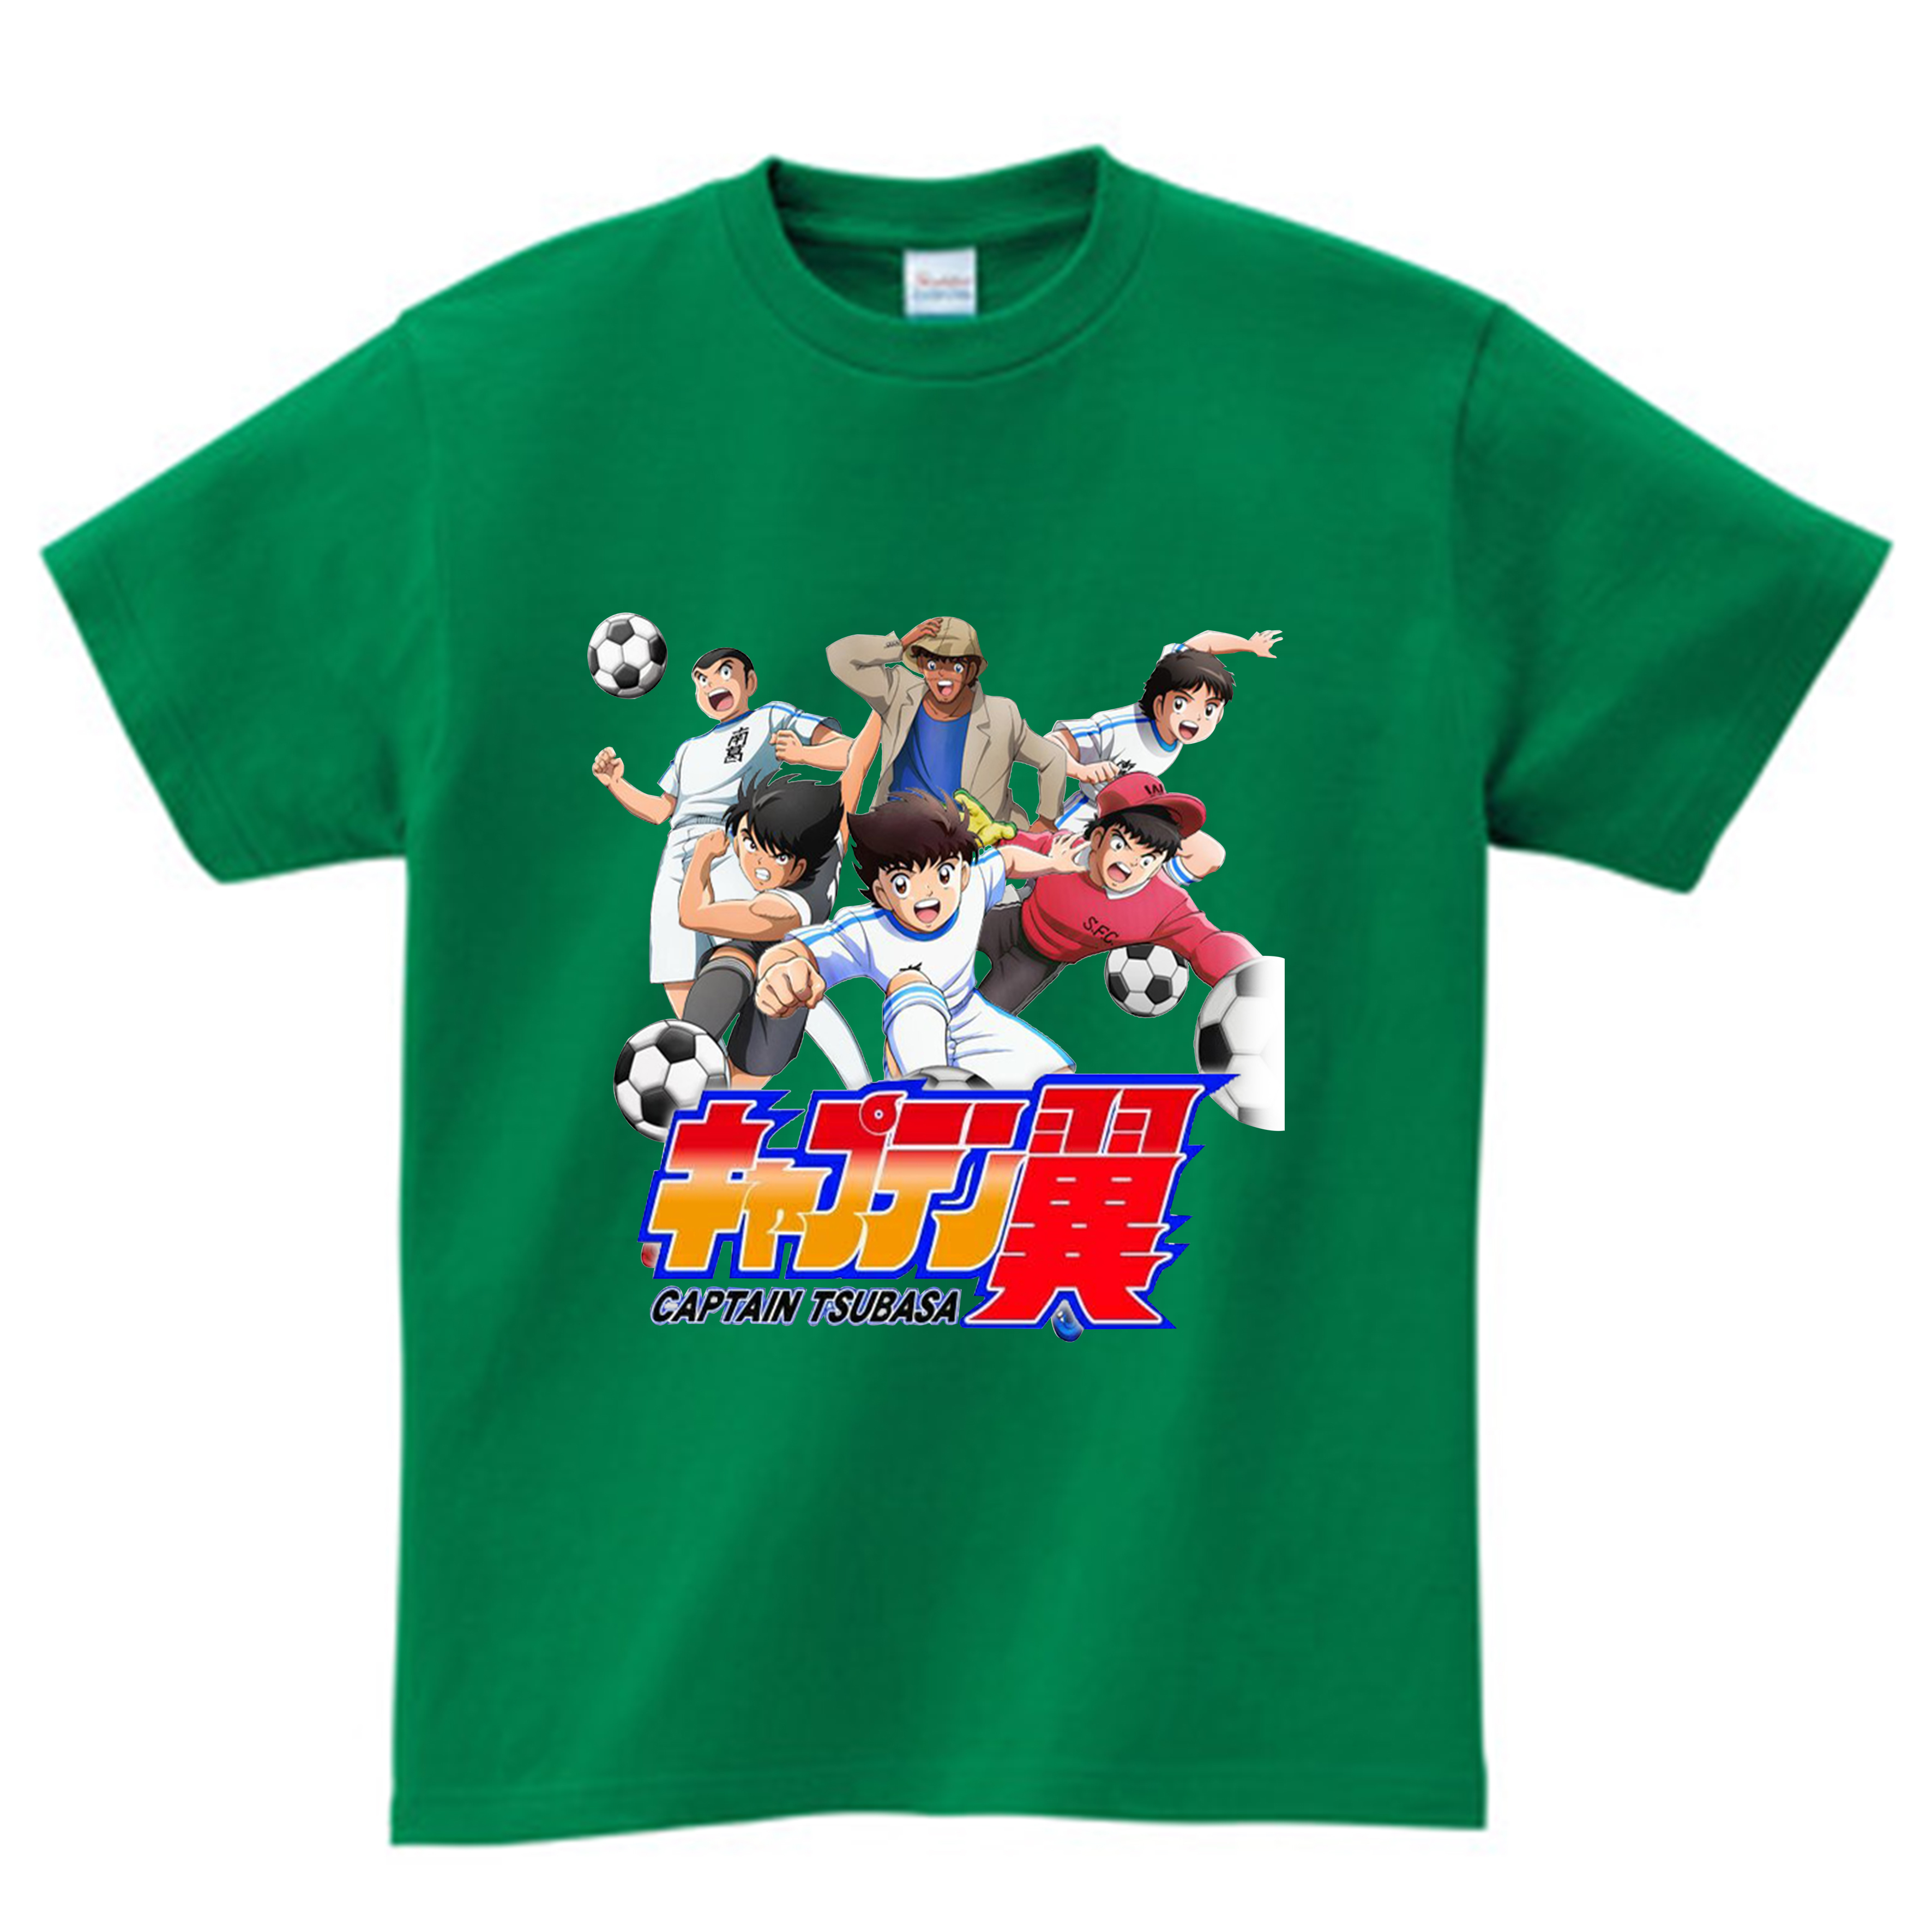 Anime Captain Tsubasa T Shirt Children Summer Leisure Short Sleeve t shirt Boy Football Motion T-shirts For Boys Girls Top 3T-9T 3